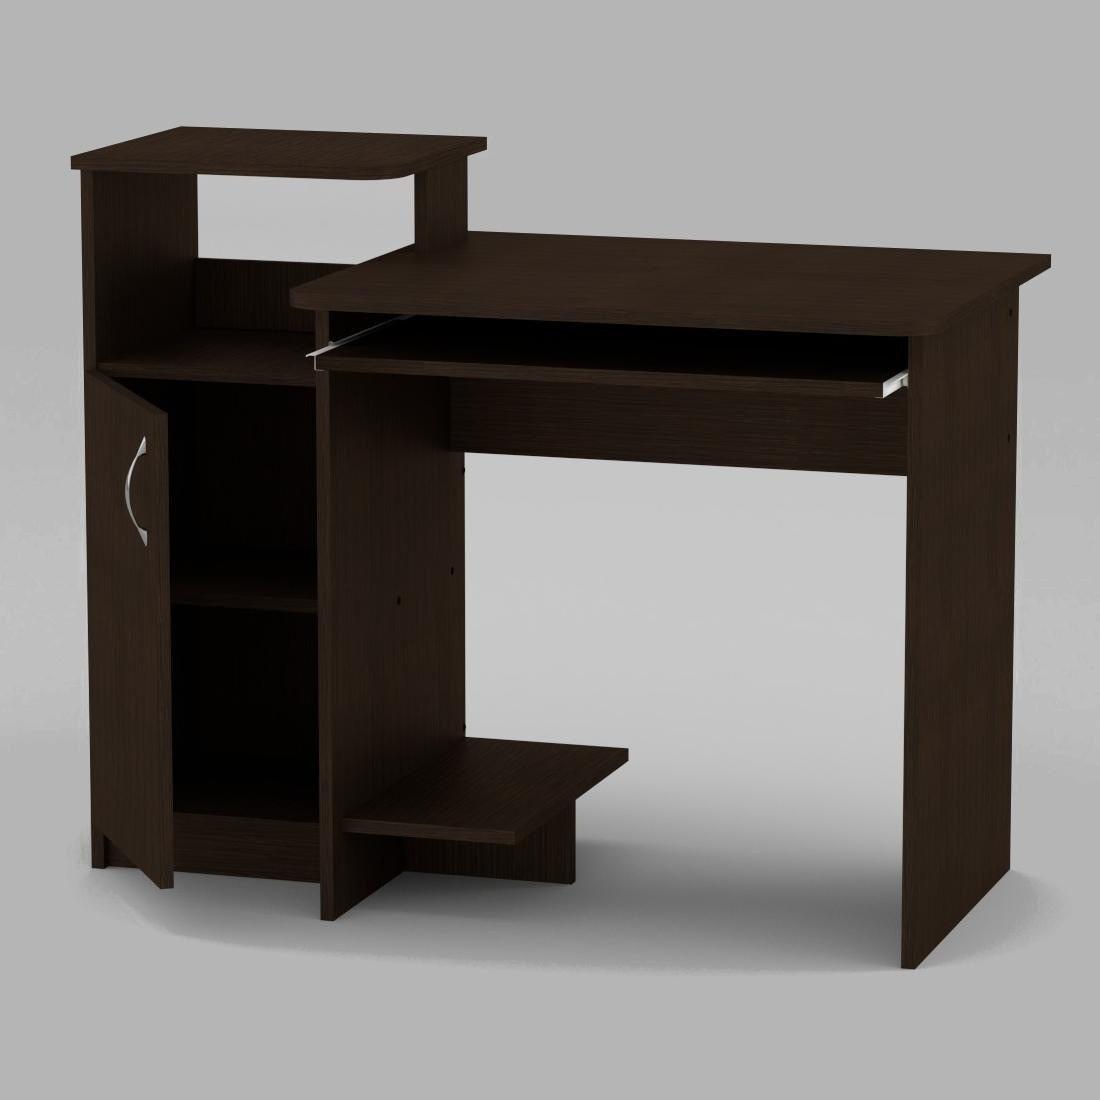 Компьютерный стол Компанит СКМ-2 1102х600х750 мм венге